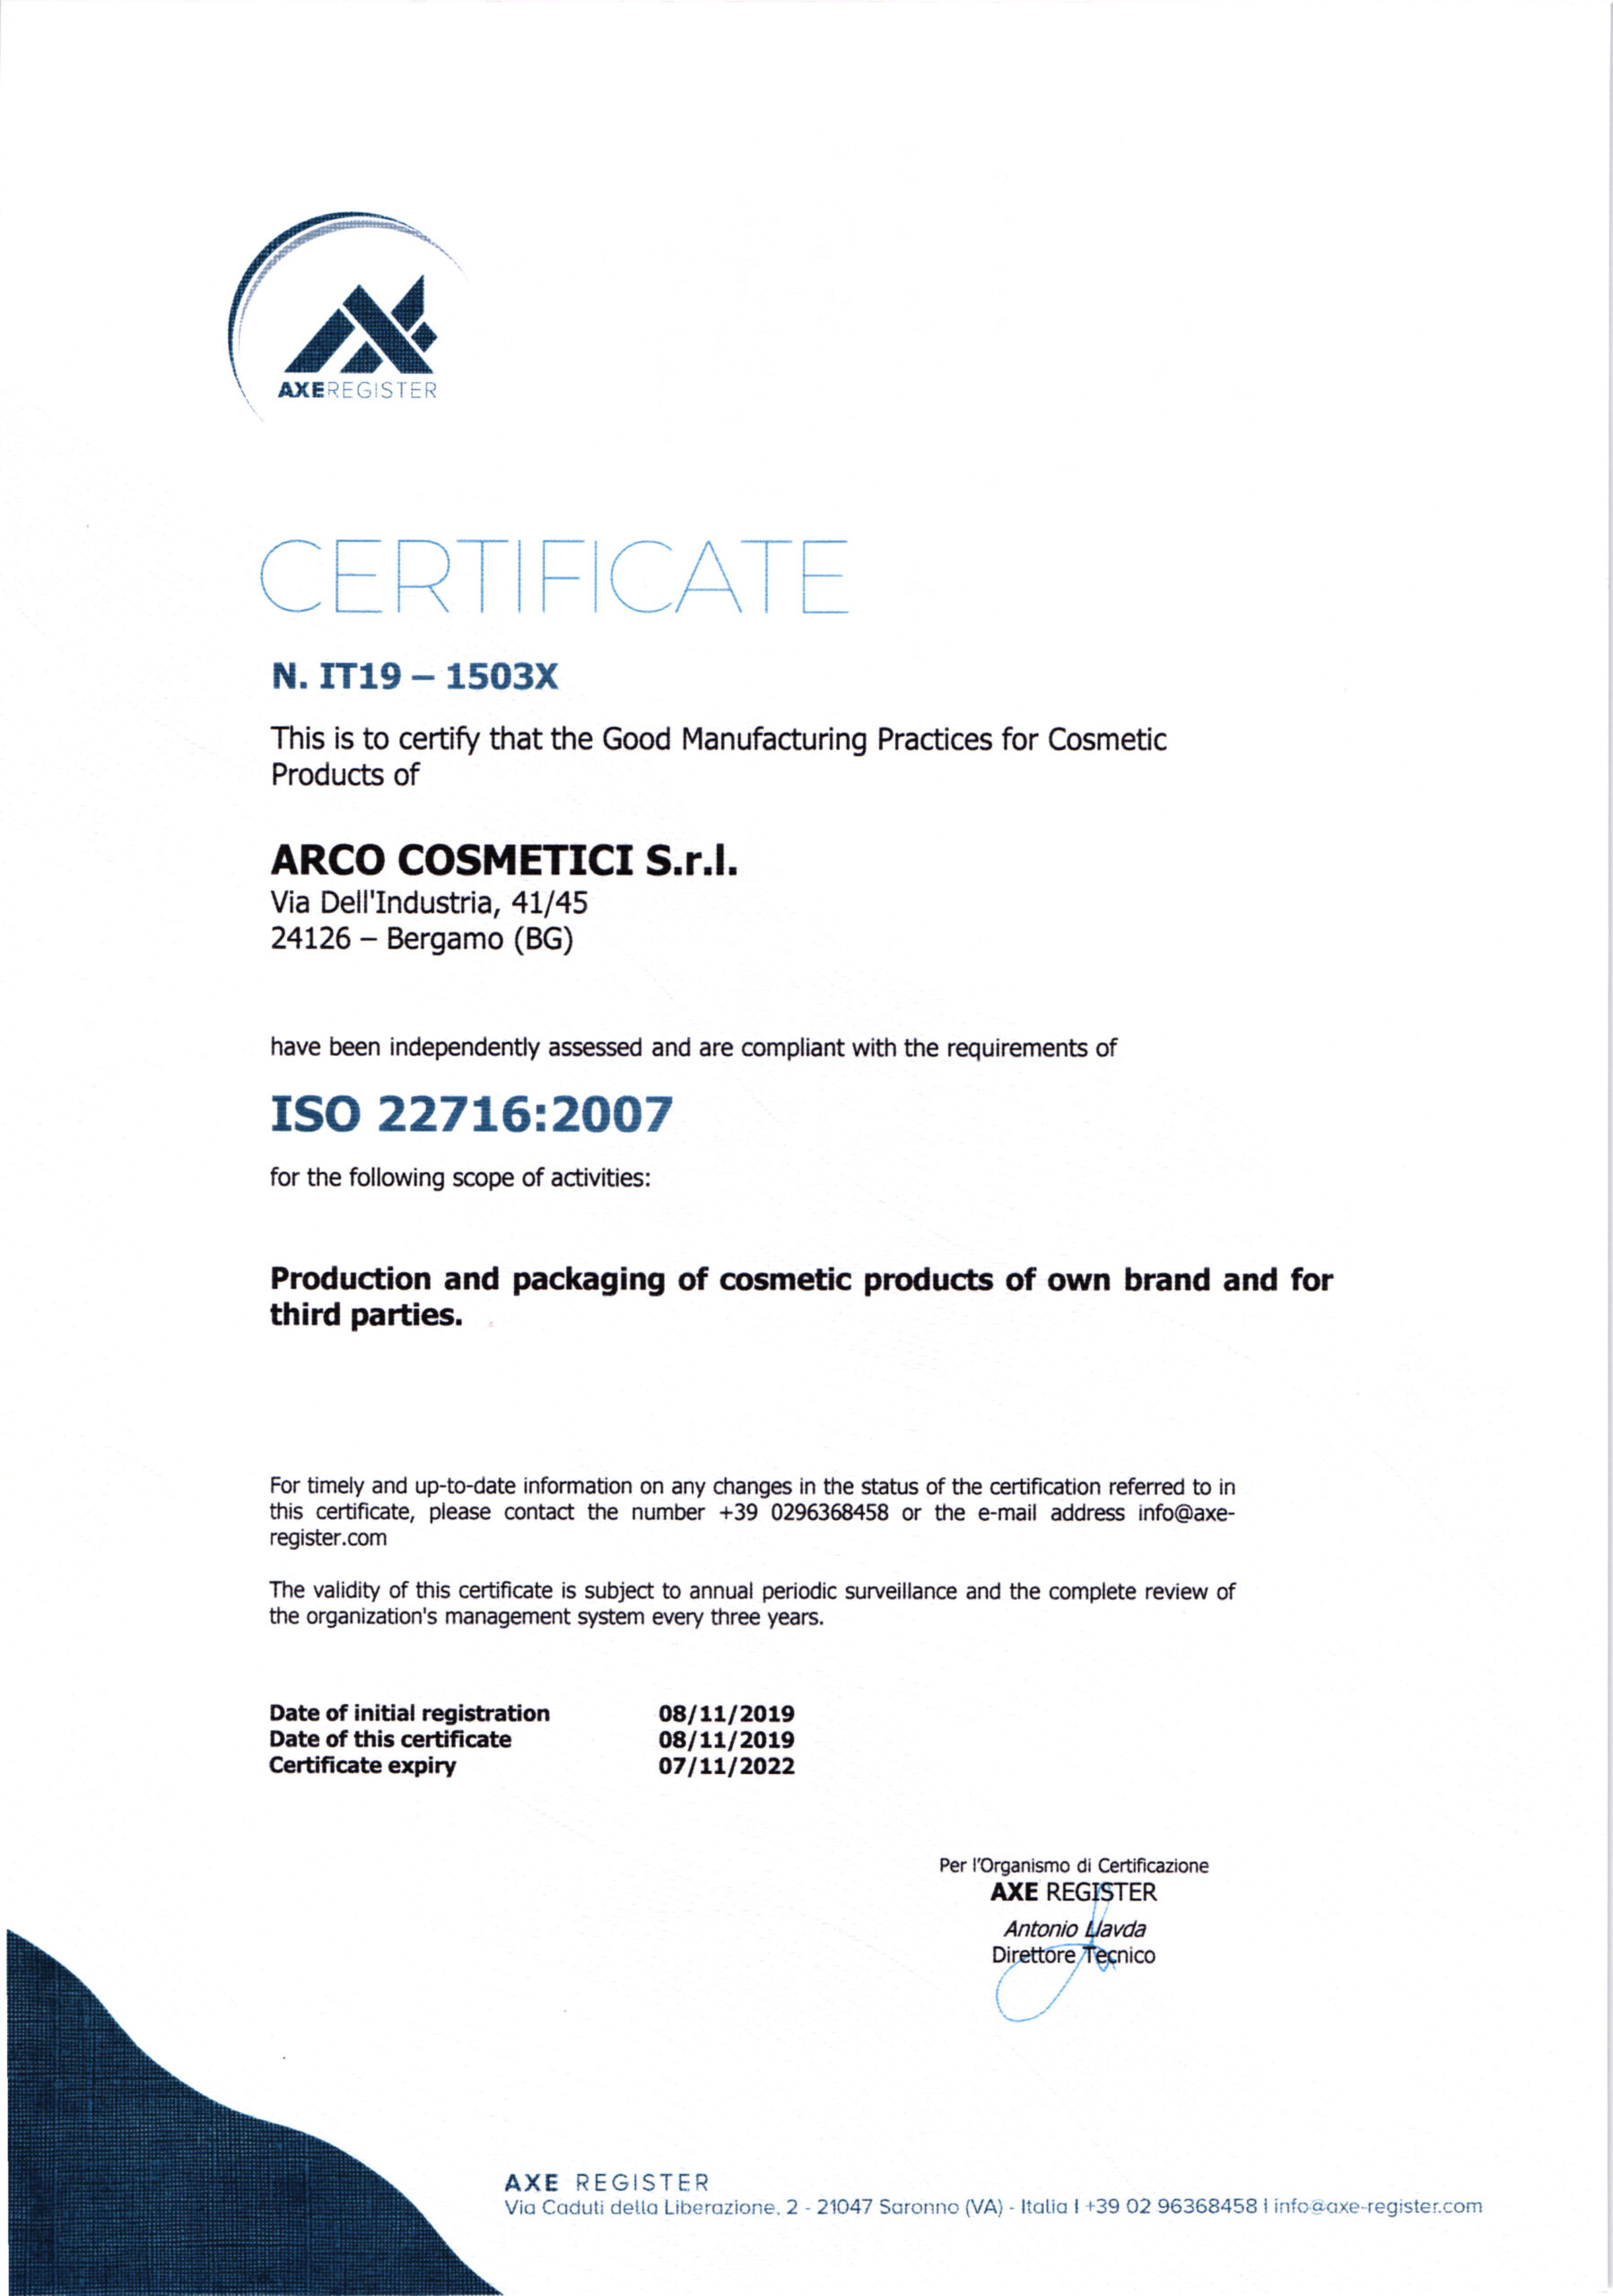 Сертификат ISO 22716 GMP надлежащая производственная практика